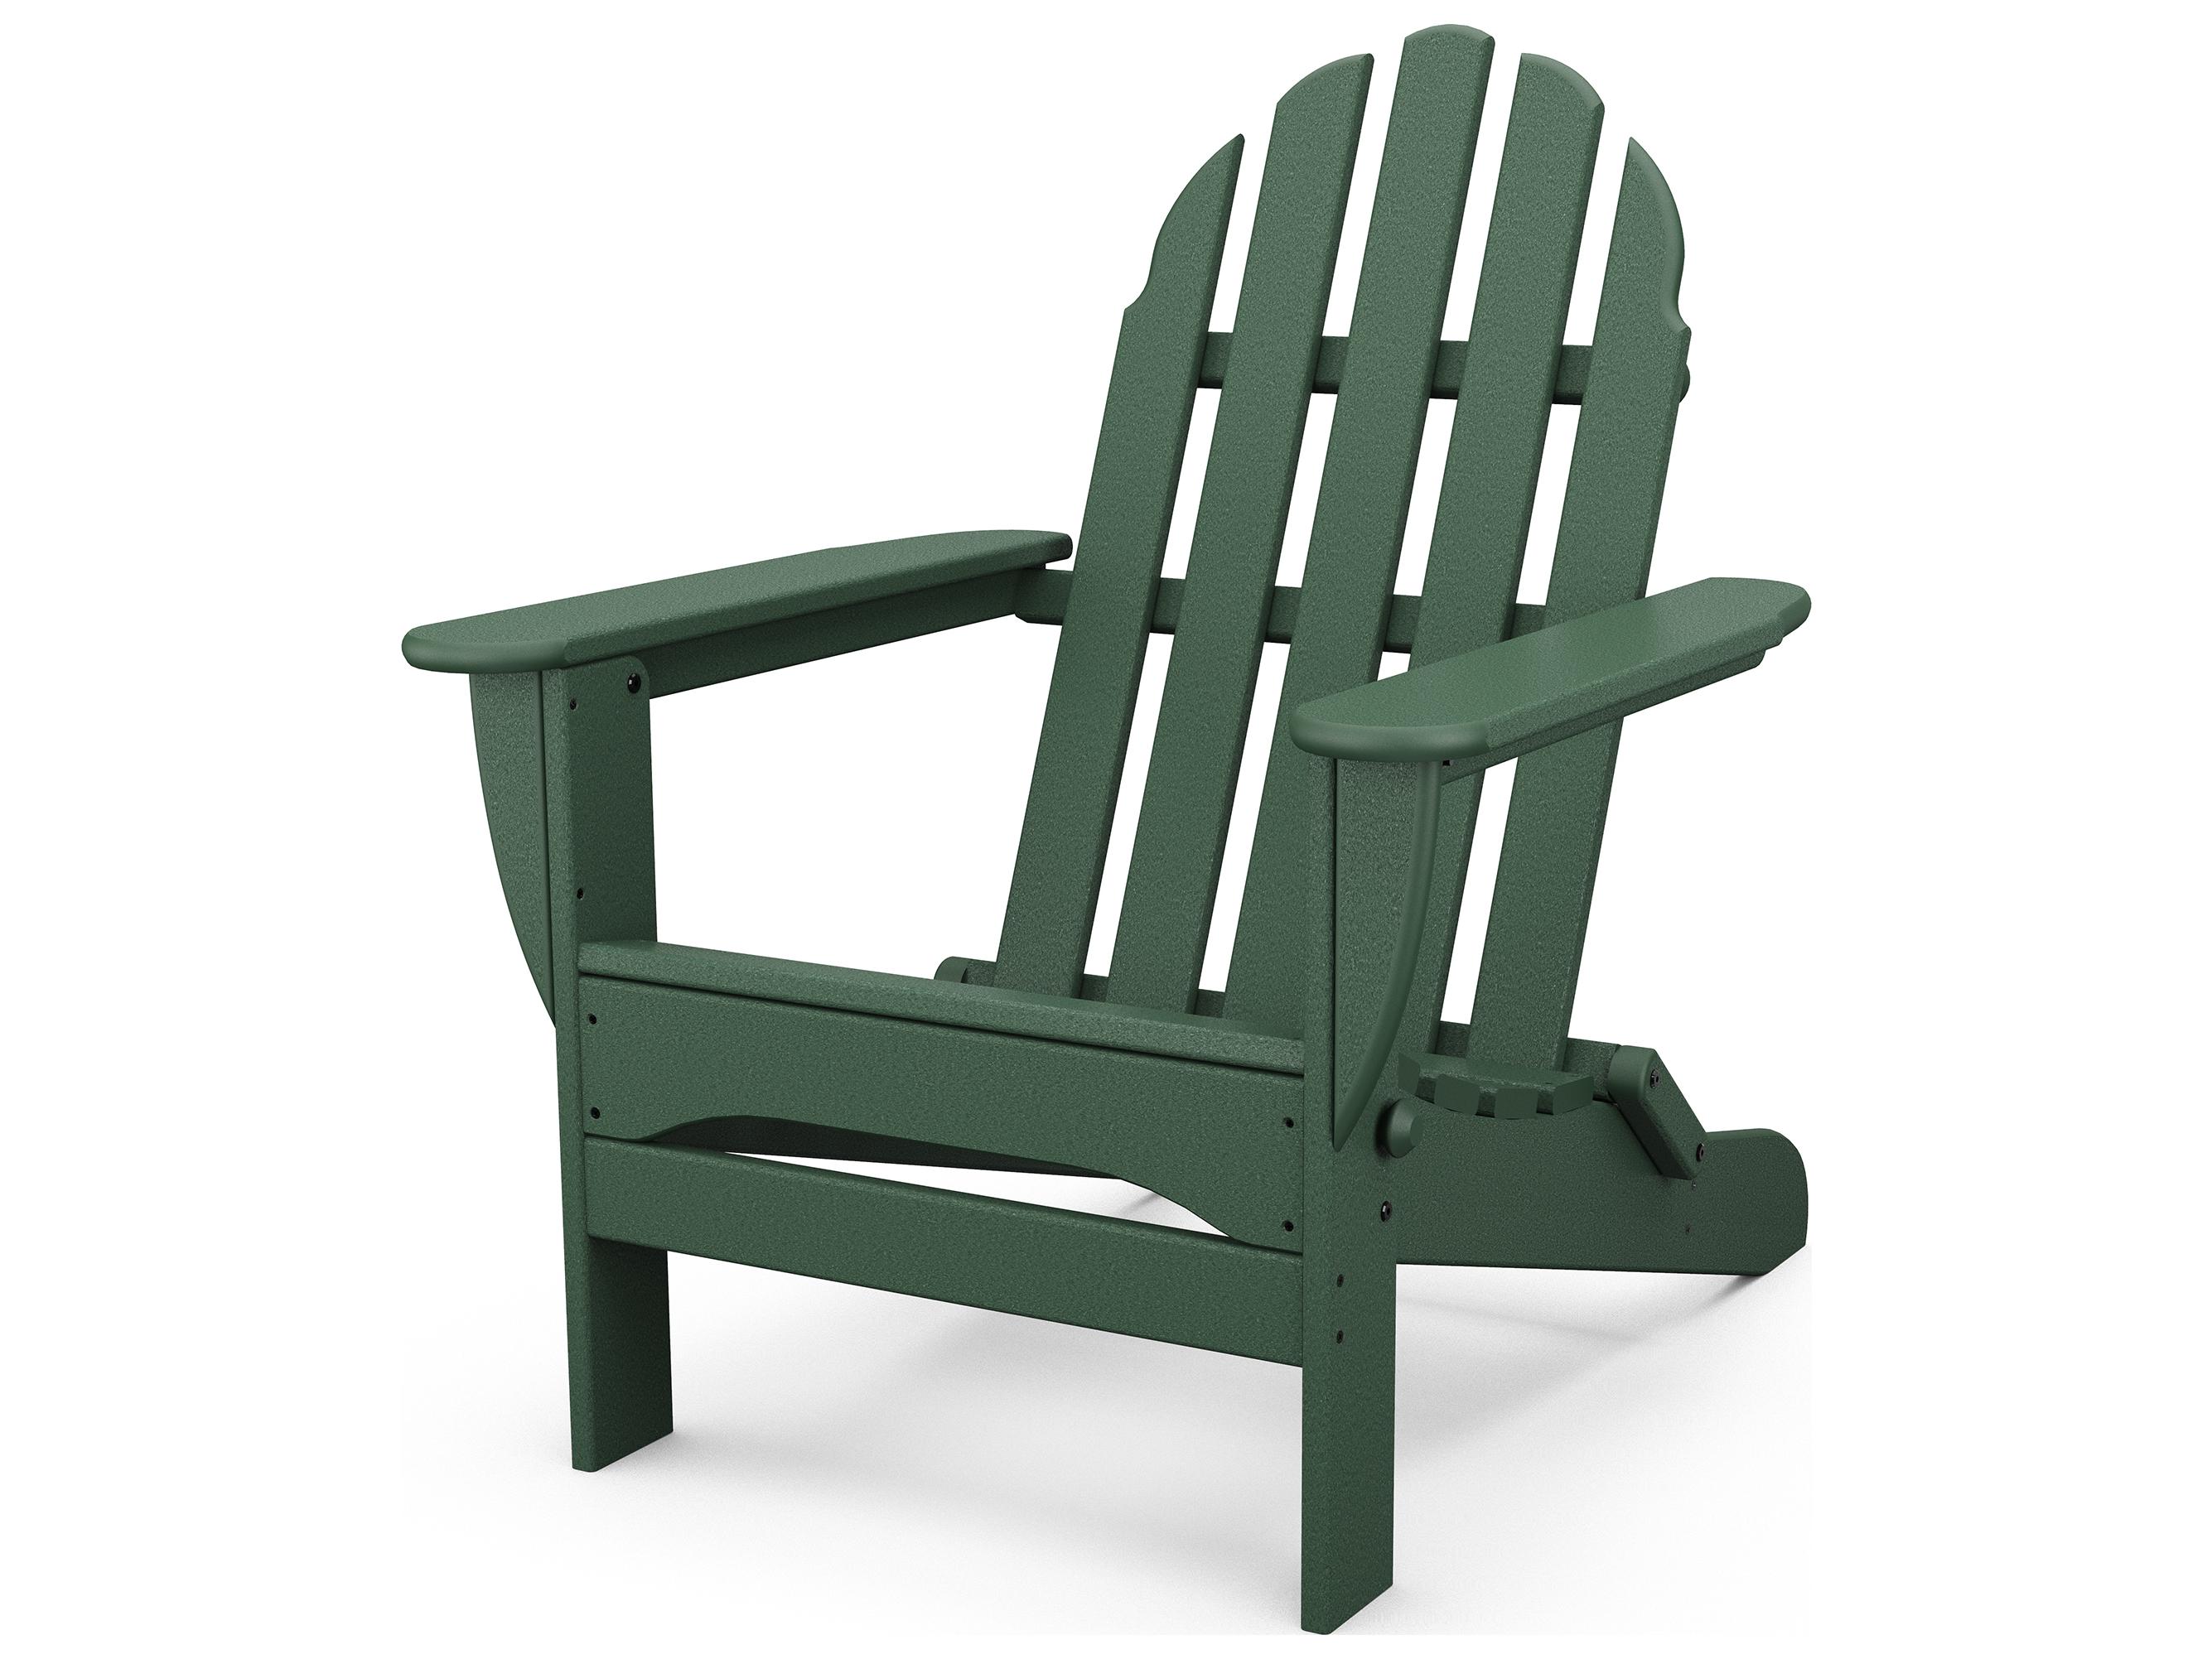 Polywood 174 Classic Adirondack Recycled Plastic Lounge Set